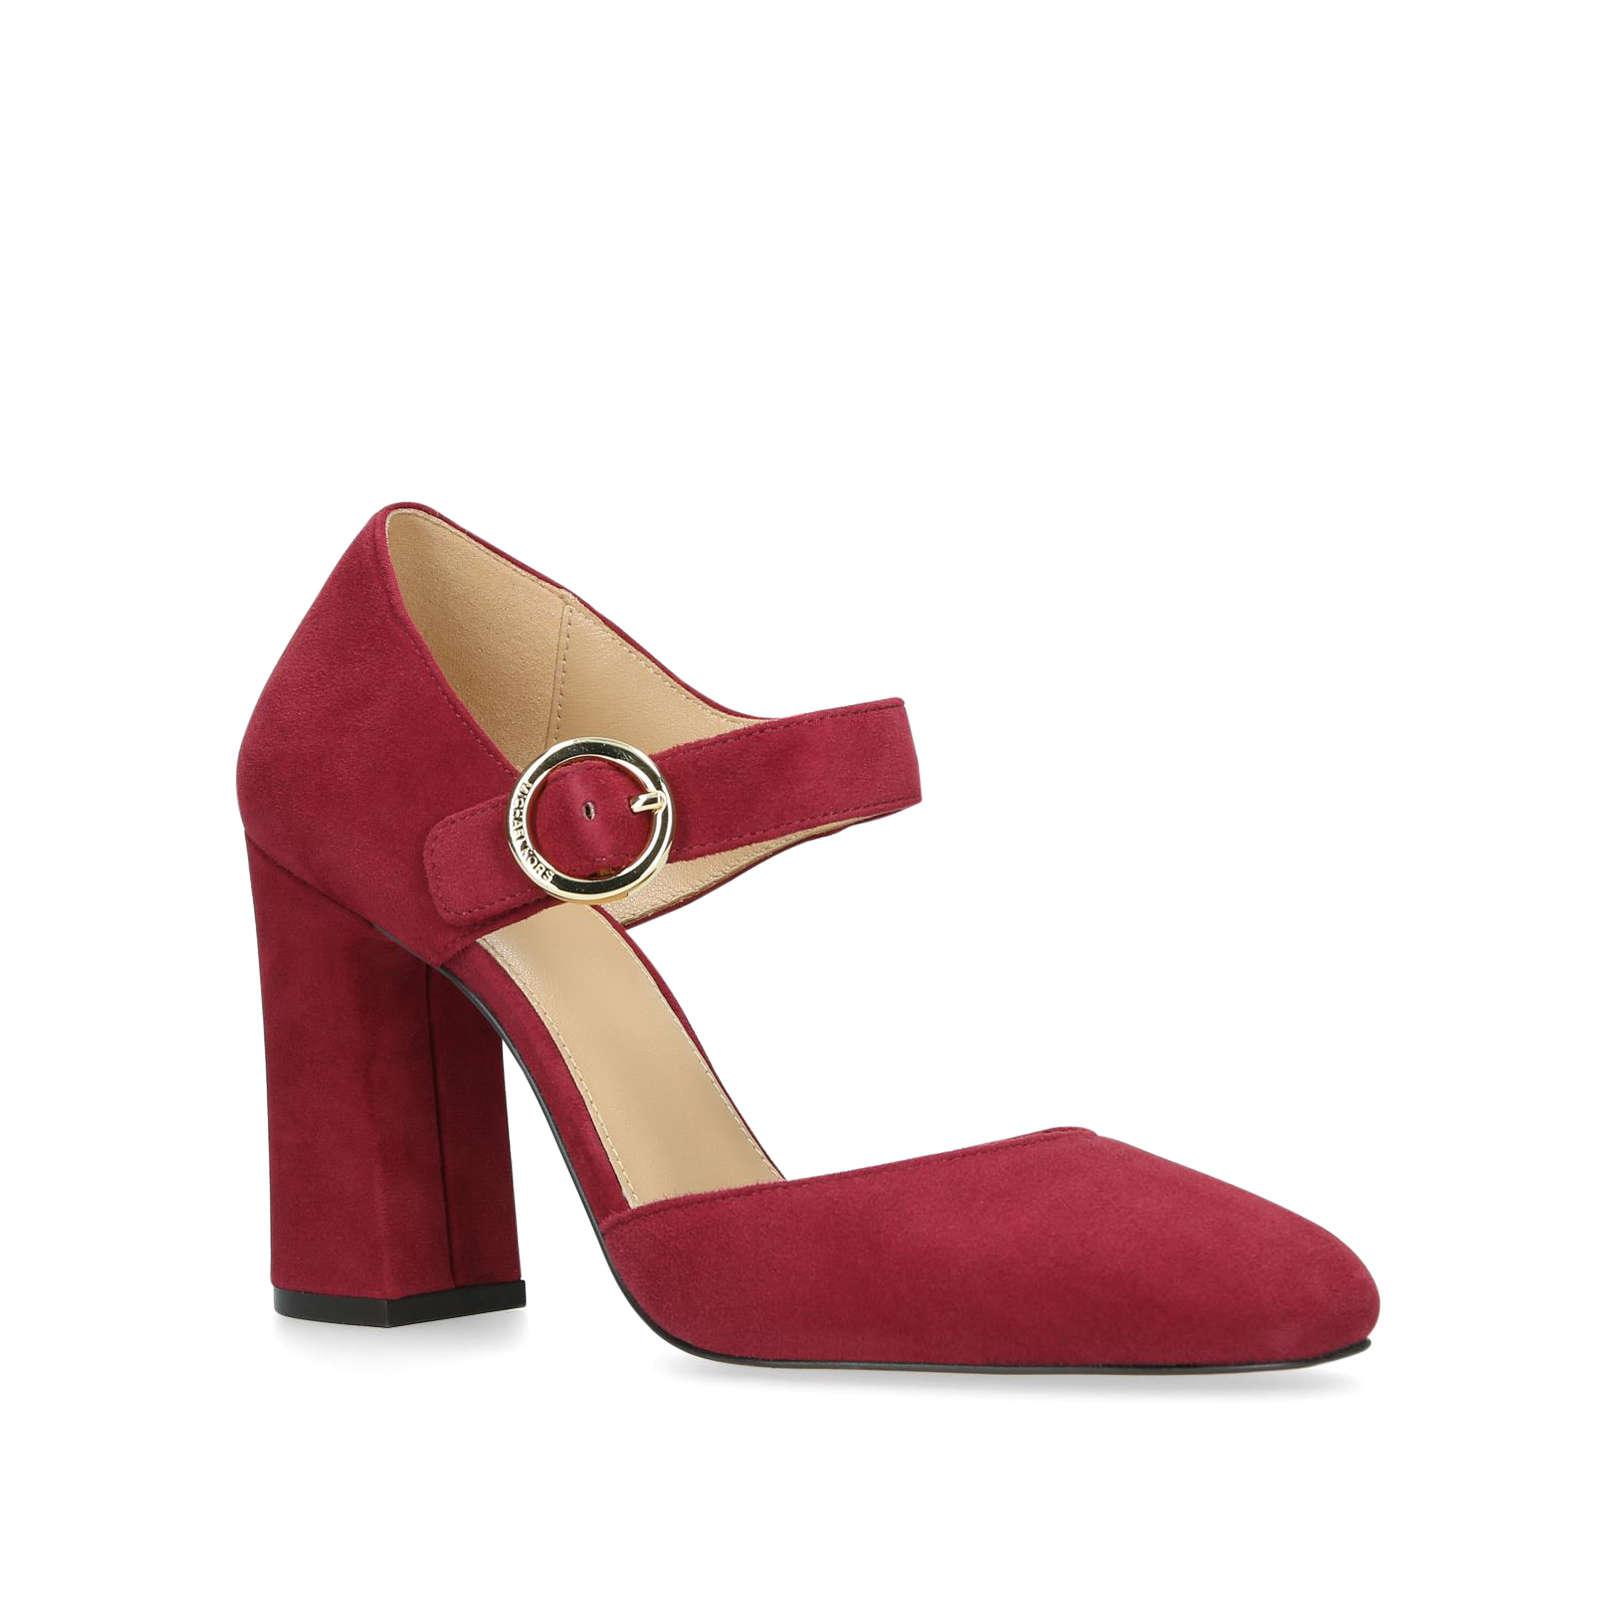 057332308197 MICHAEL Michael Kors Alana Closed Toe in Red - Lyst